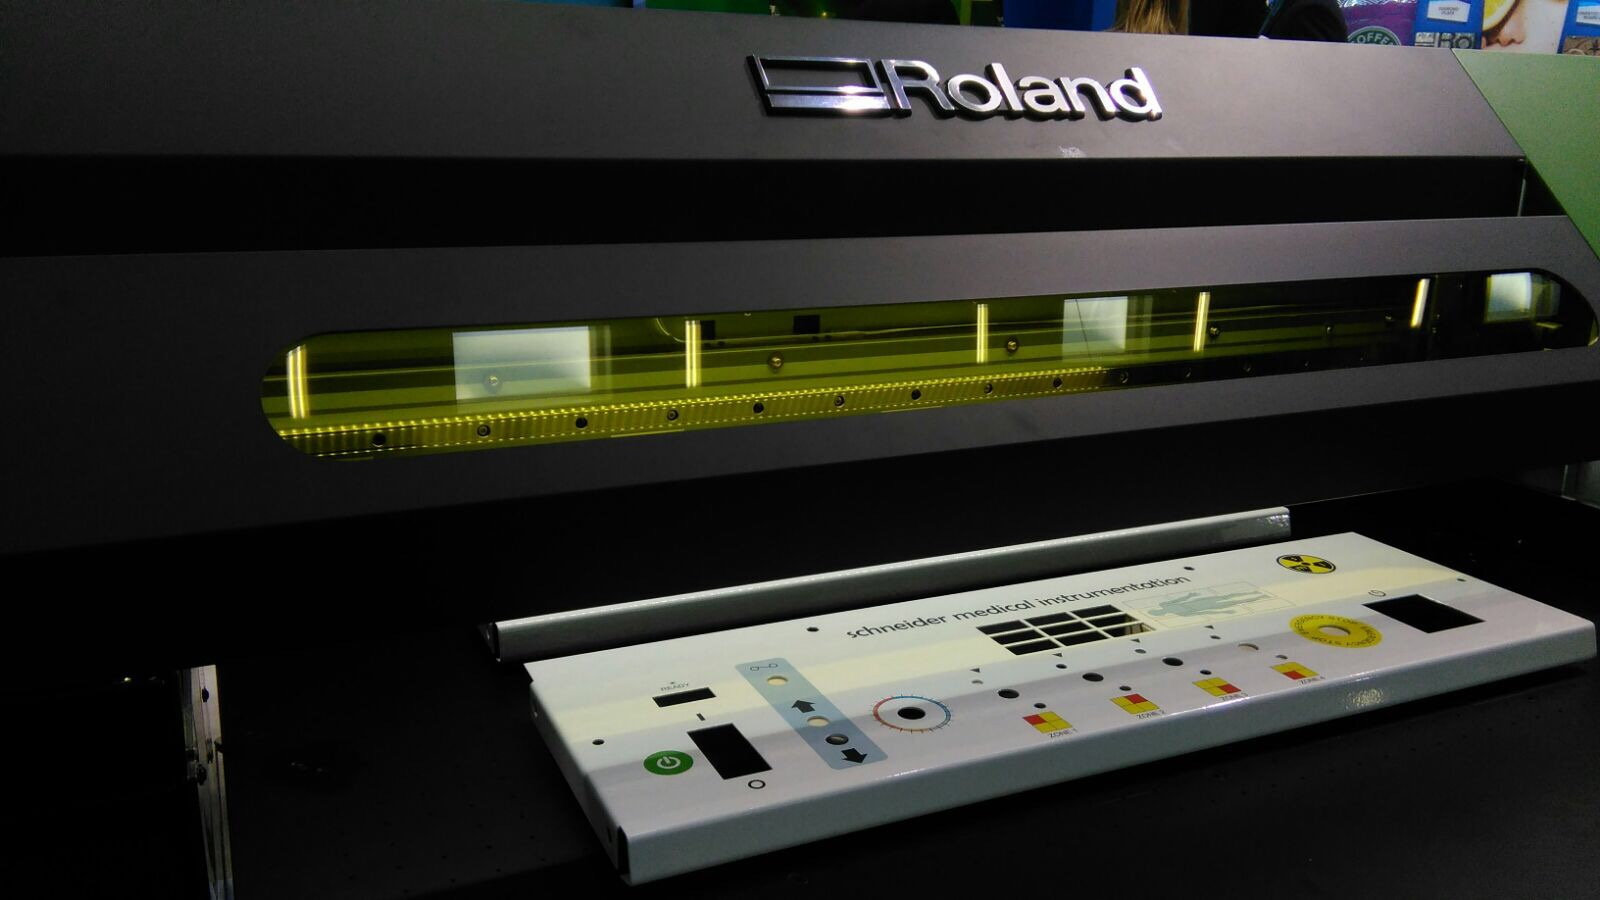 The VersaUV S-Series printing control panels at InPrint Munich